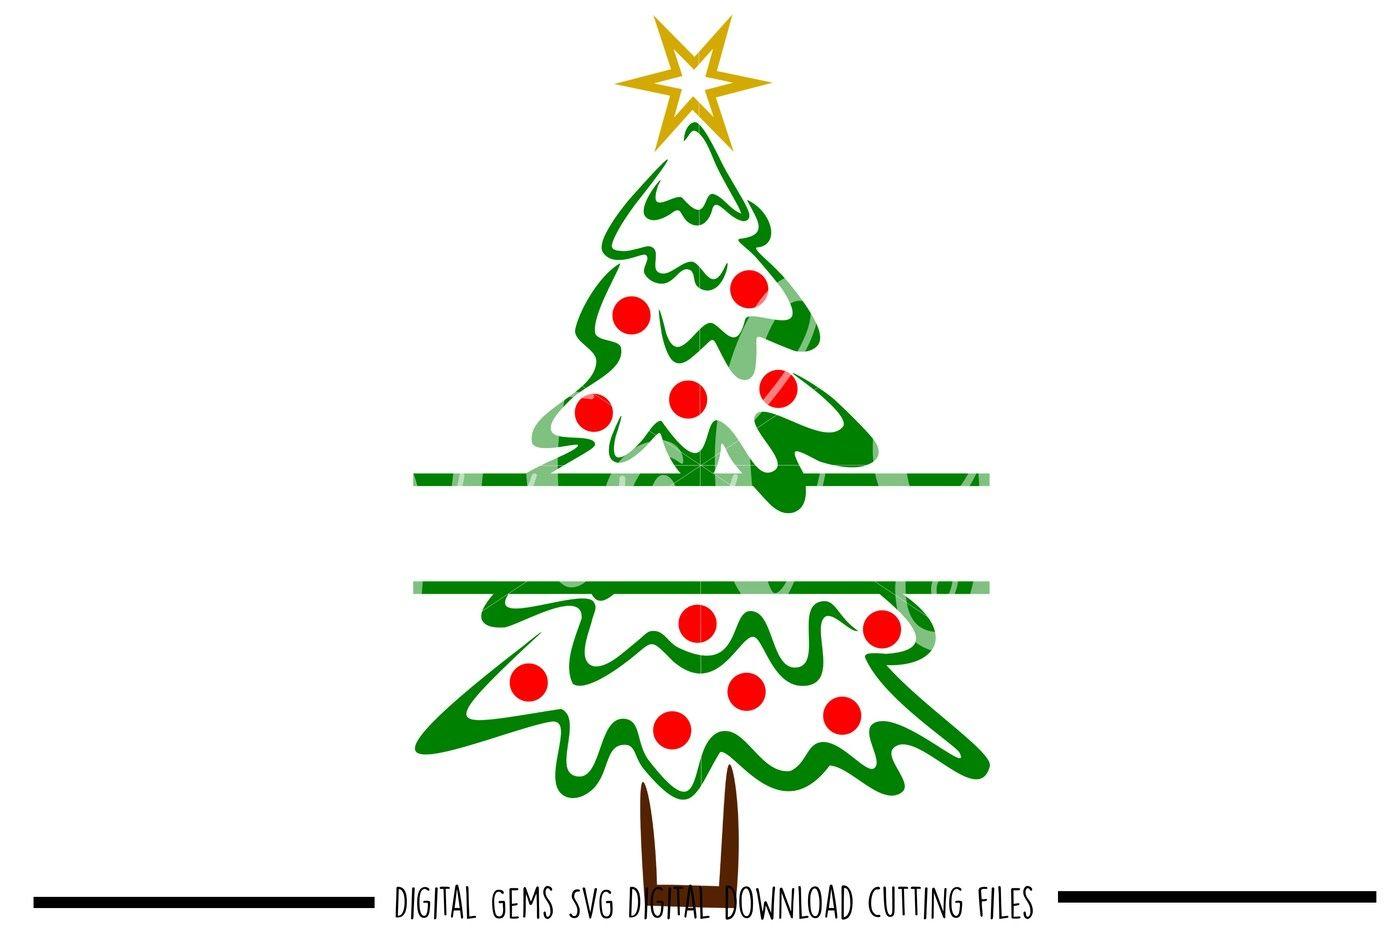 Split Christmas Tree Svg Dxf Eps Png Files By Digital Gems Thehungryjpeg Com